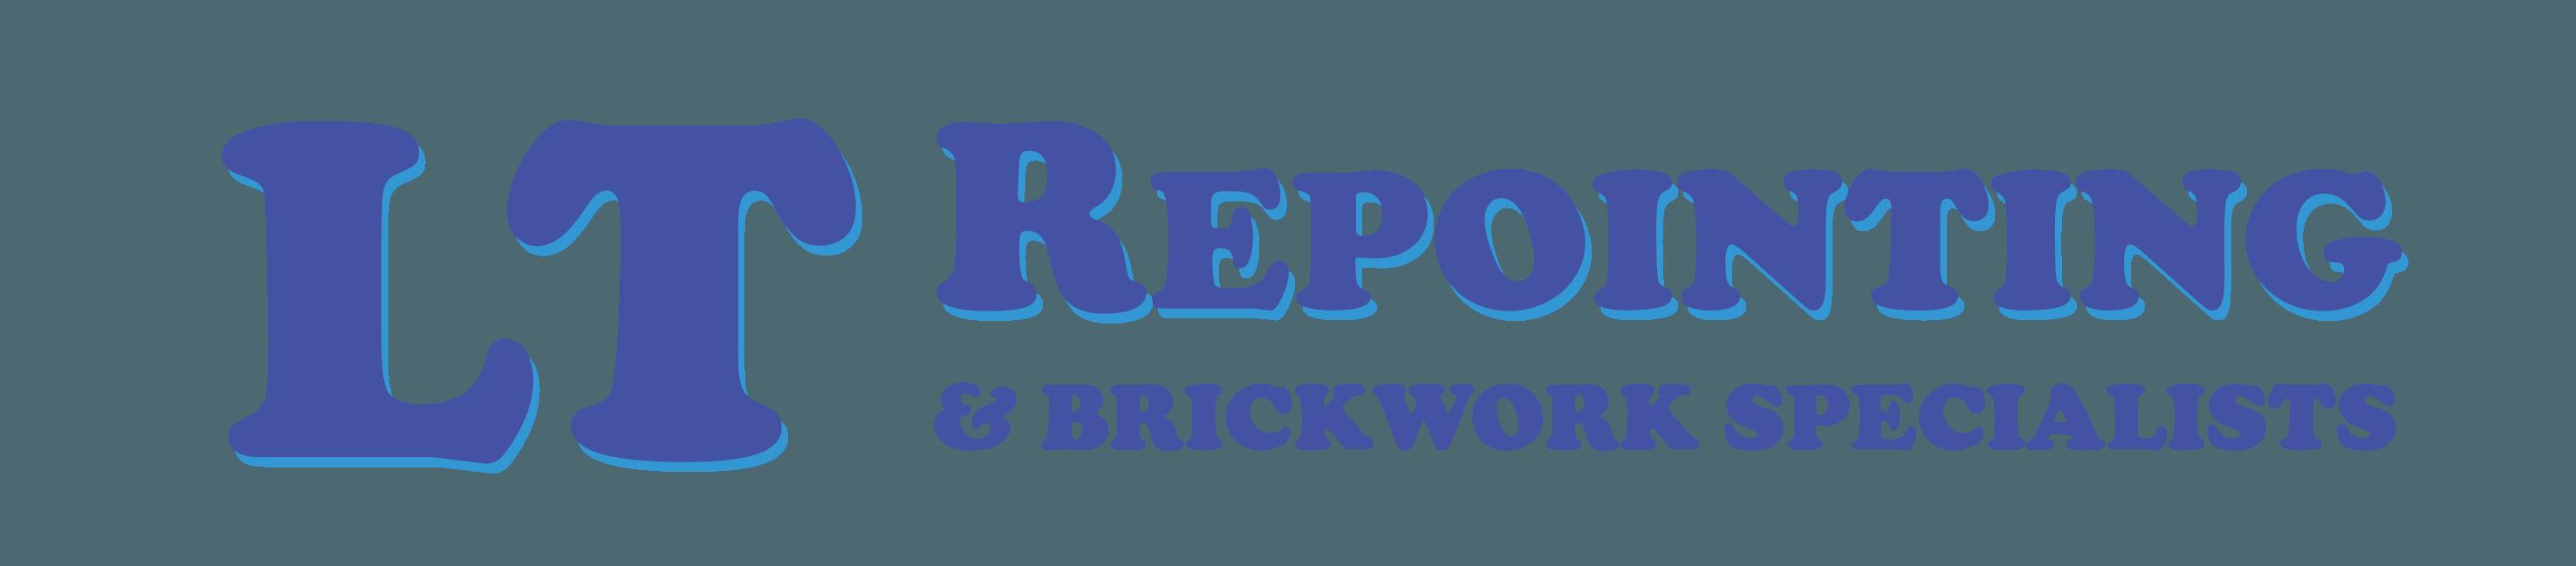 Lt Brickwork